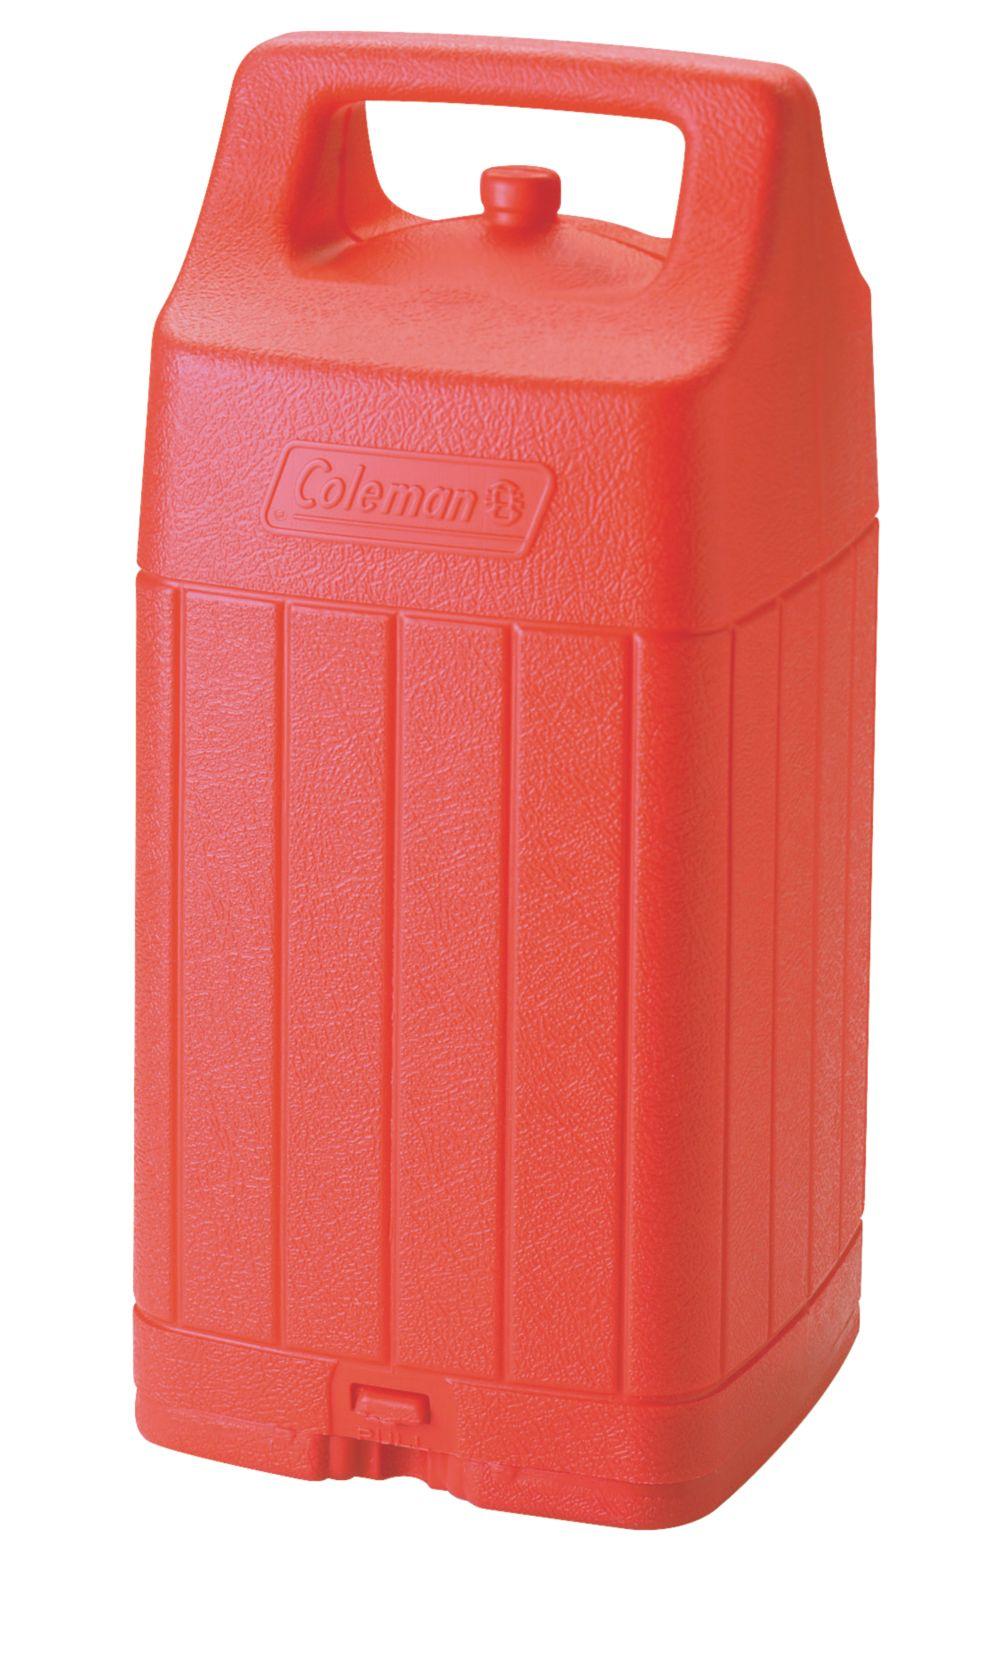 Lantern Hard Shell Carry Case